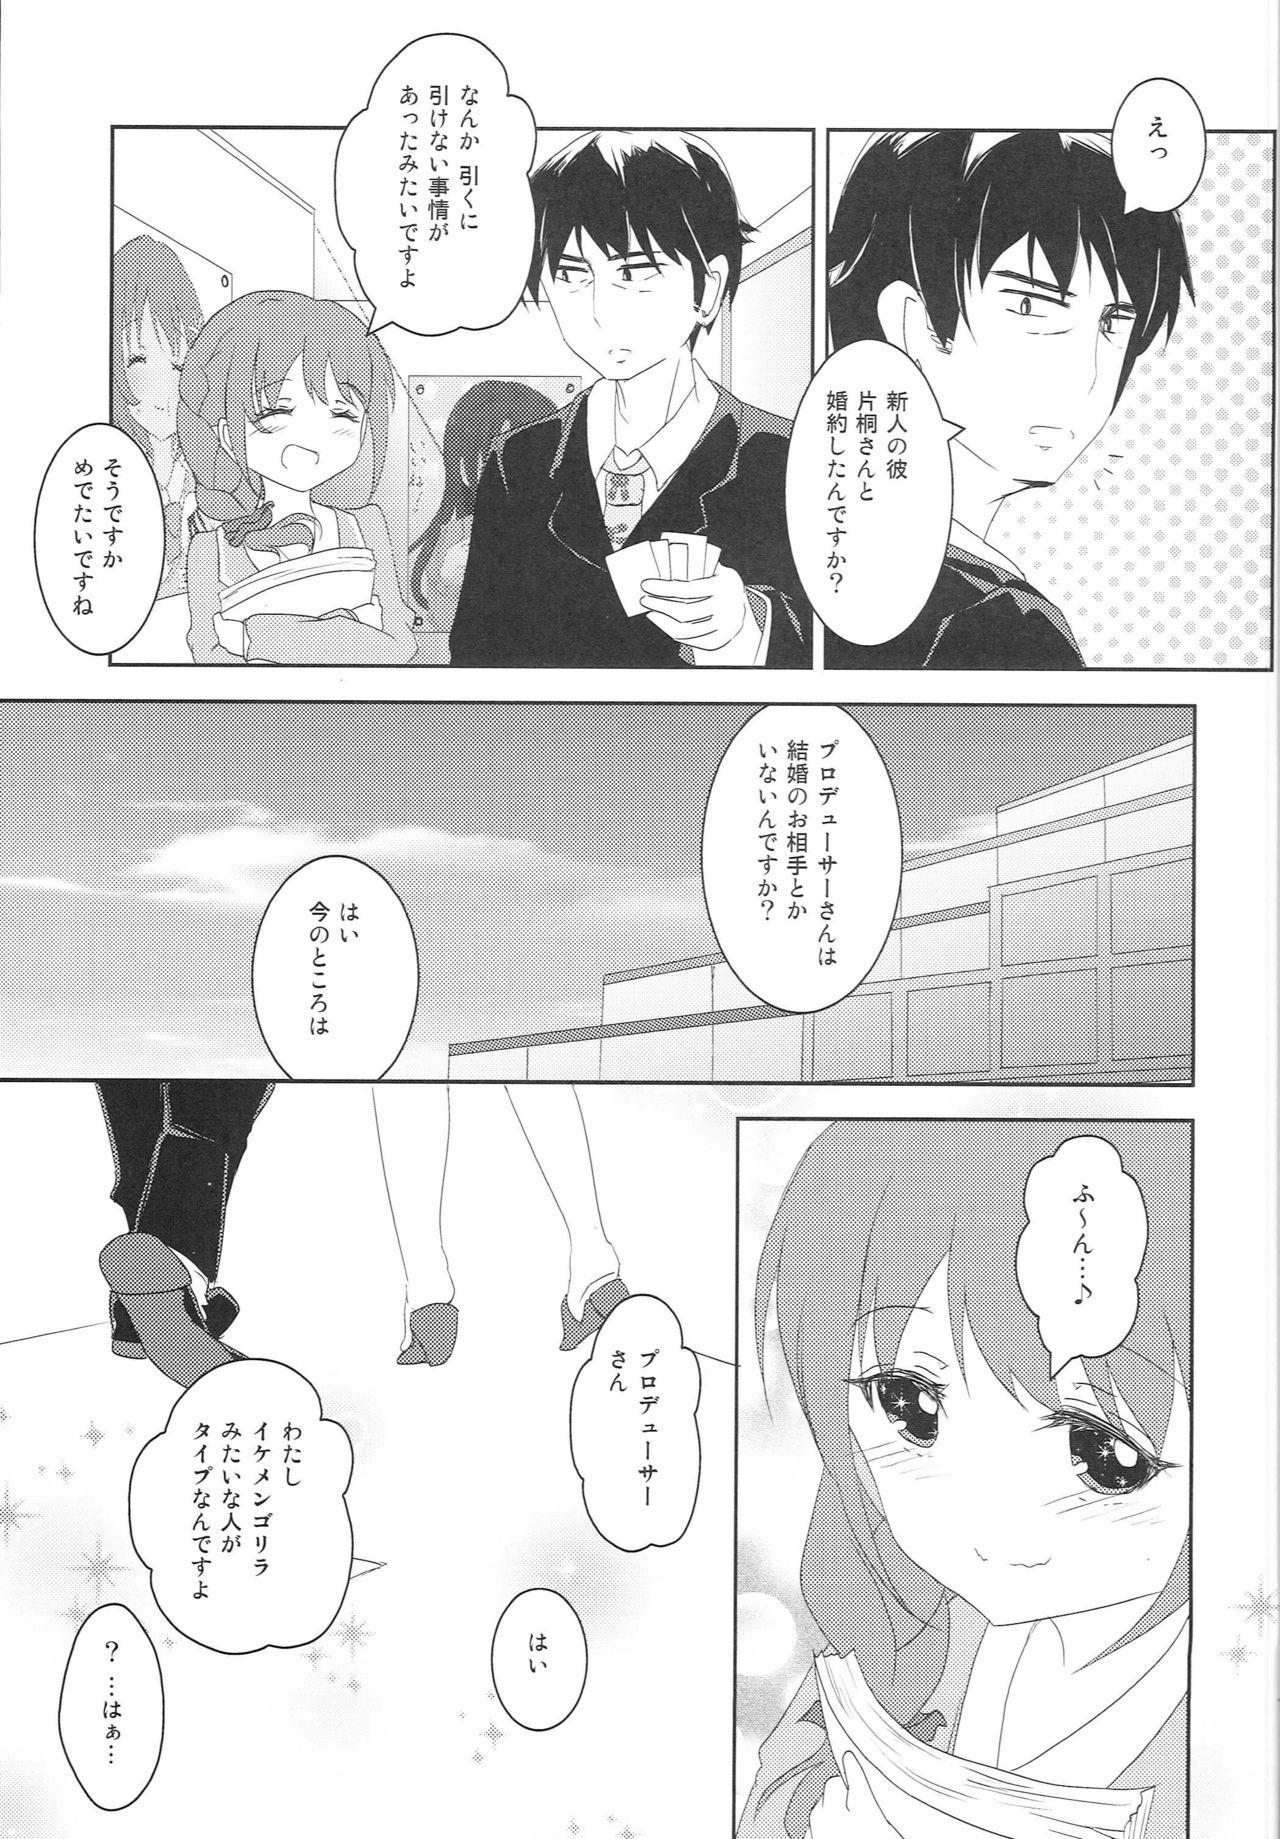 (CINDERELLA FESTIV@L) [Ribbon Enikki+ (Mickeysmith)] Chihiro-san ni Kokuhaku Shitara, Idol-tachi ni Mawasaretanda ga. (THE IDOLM@STER CINDERELLA GIRLS) 13